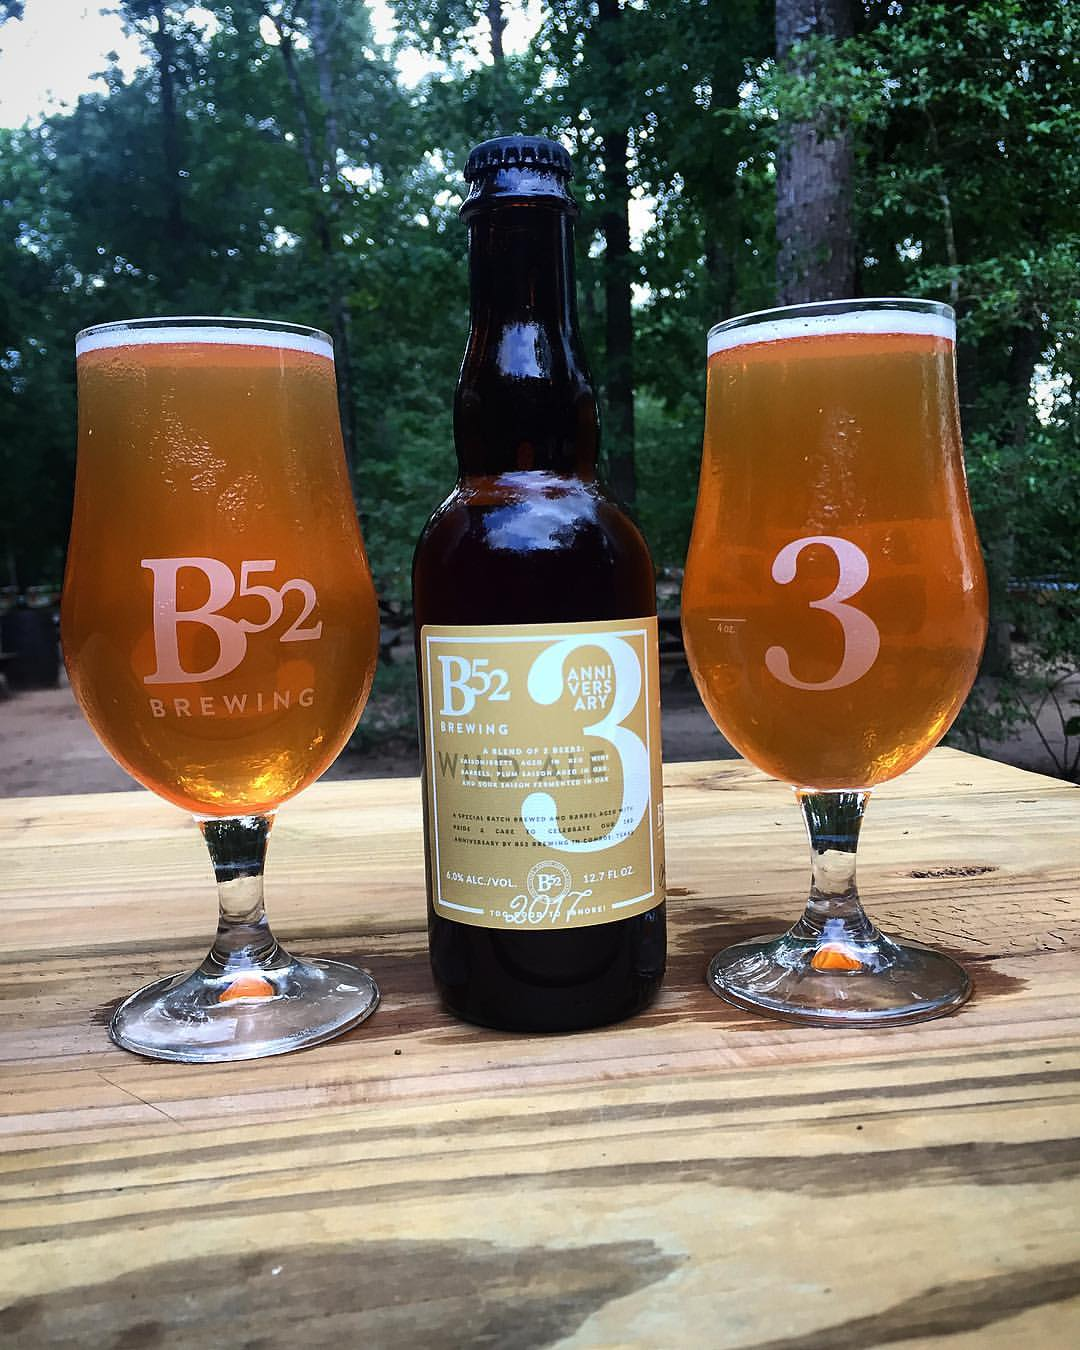 B52 Brewing   3 Year Anniversary Blend Wild Ale